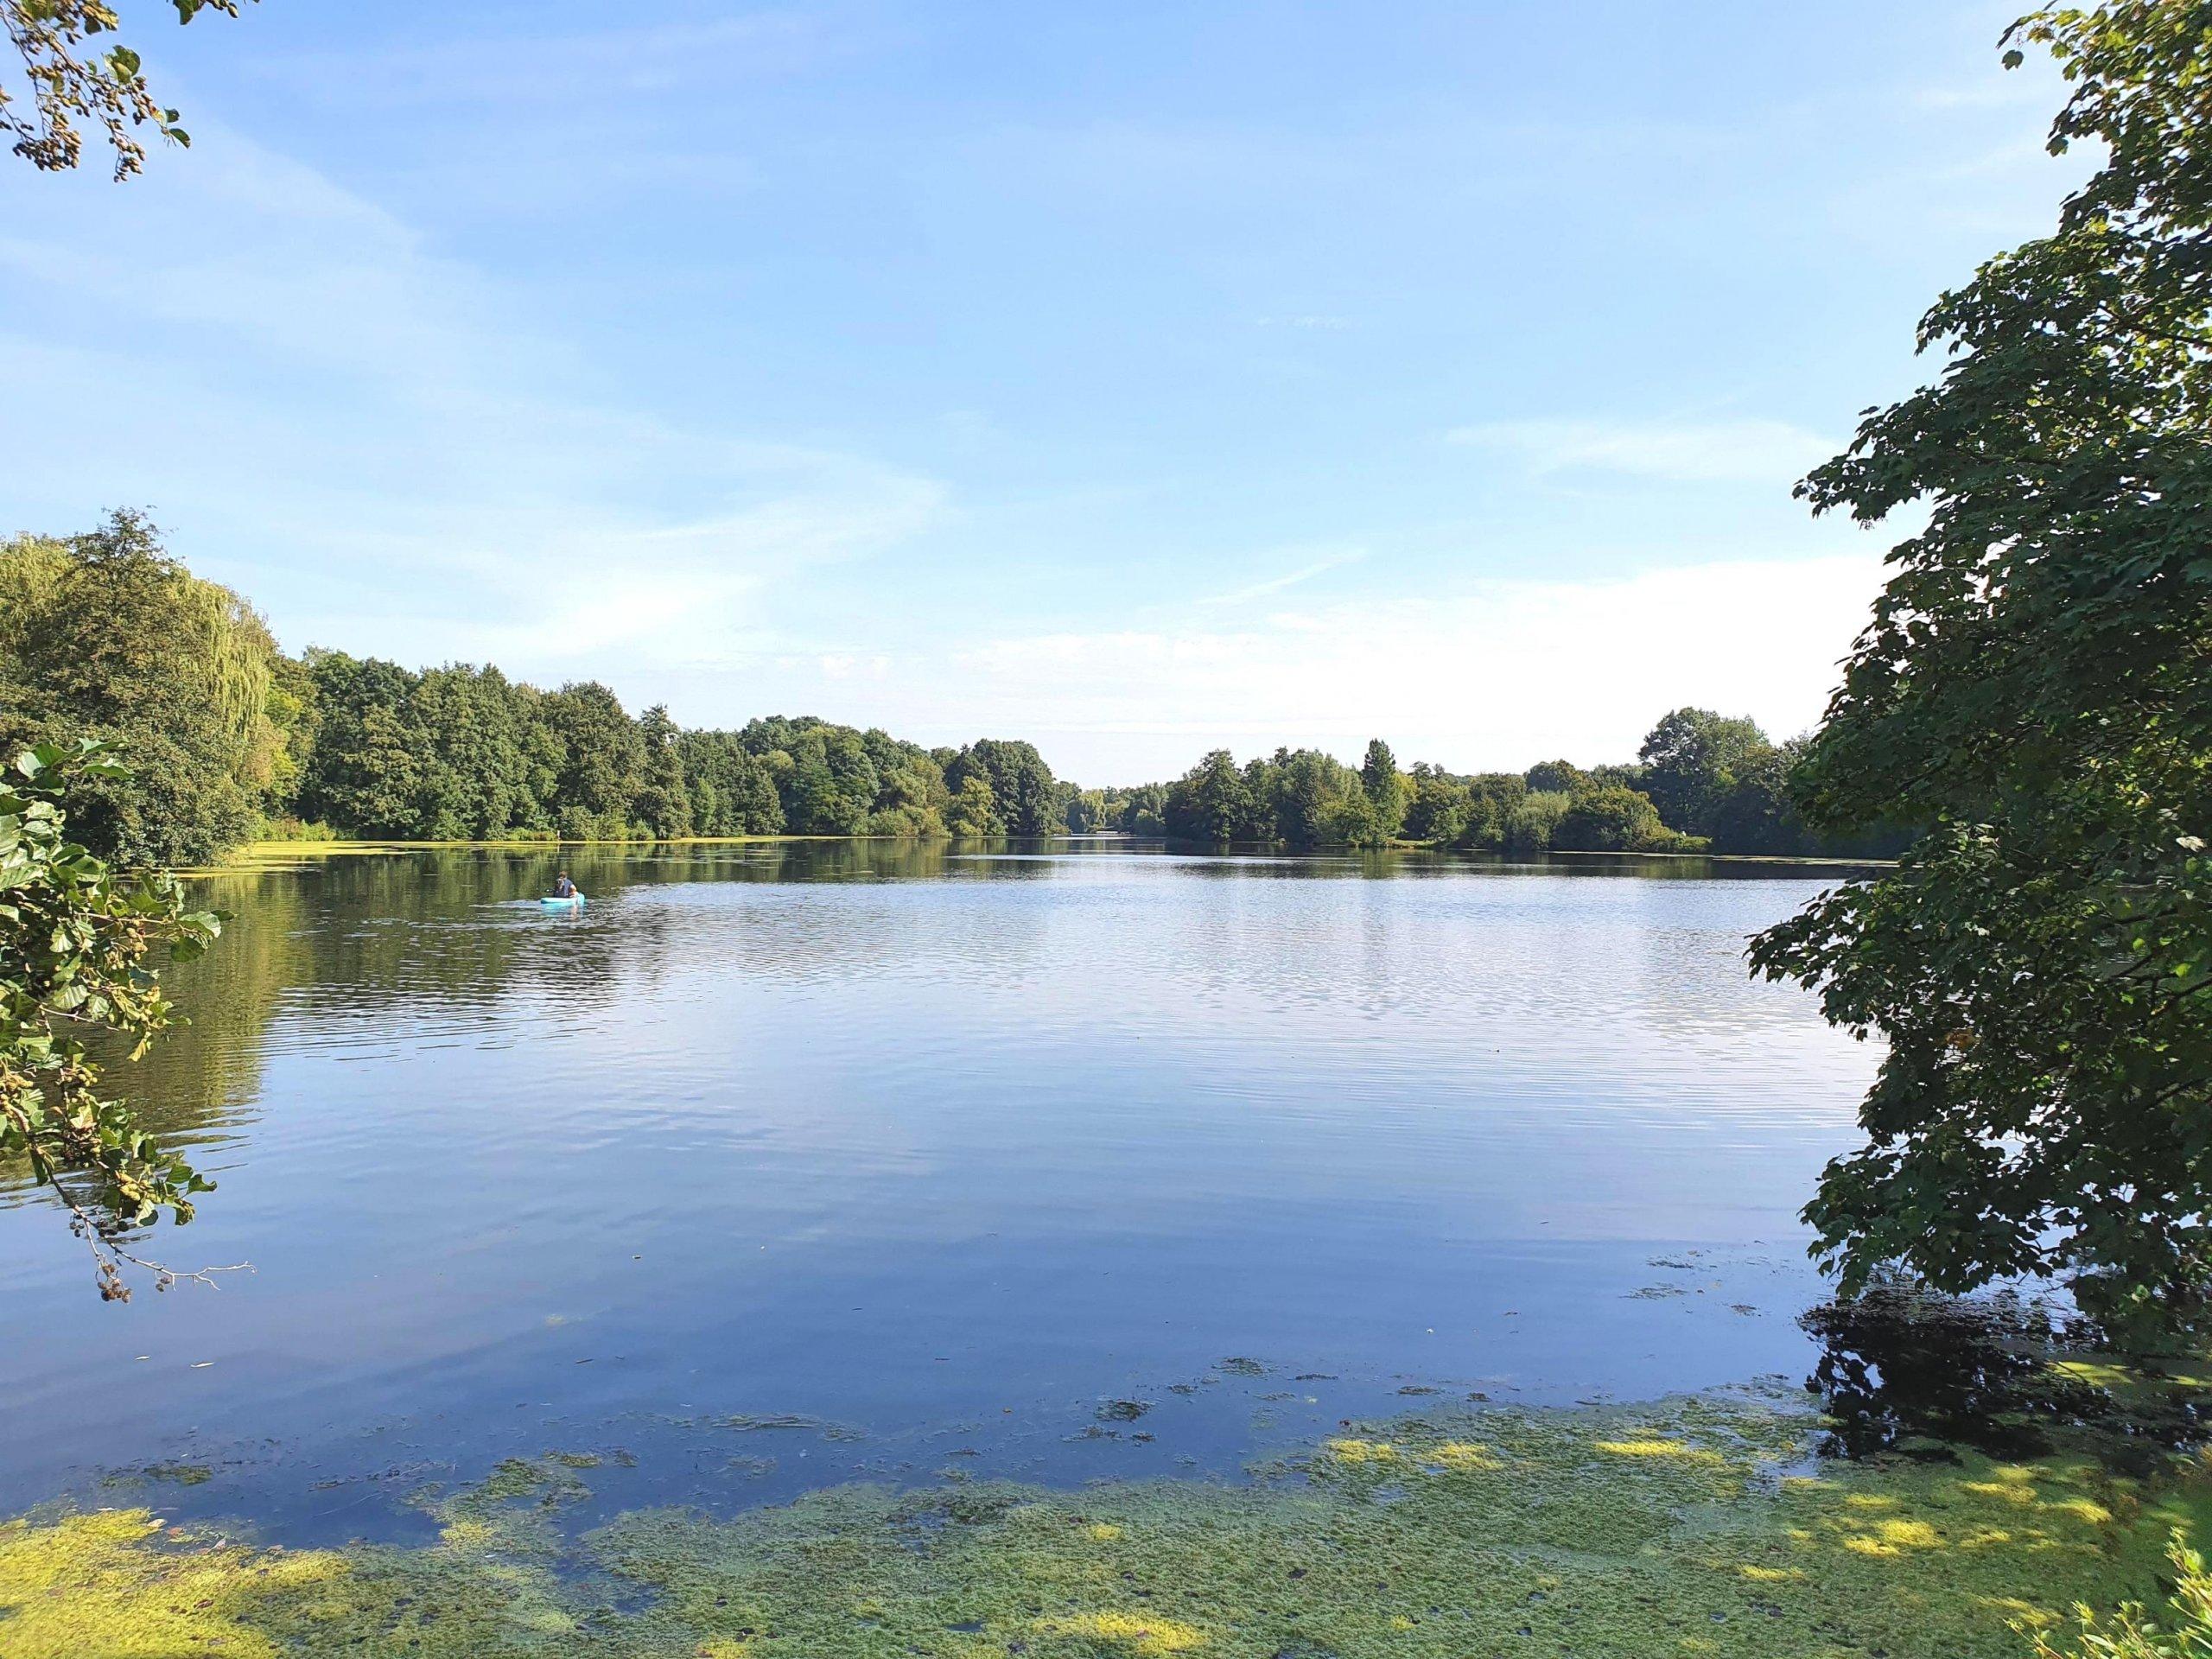 Pröbstingsee, Neubau-Doppelhaushälfte in Borken-Hoxfeld! – Rohbauvariante –